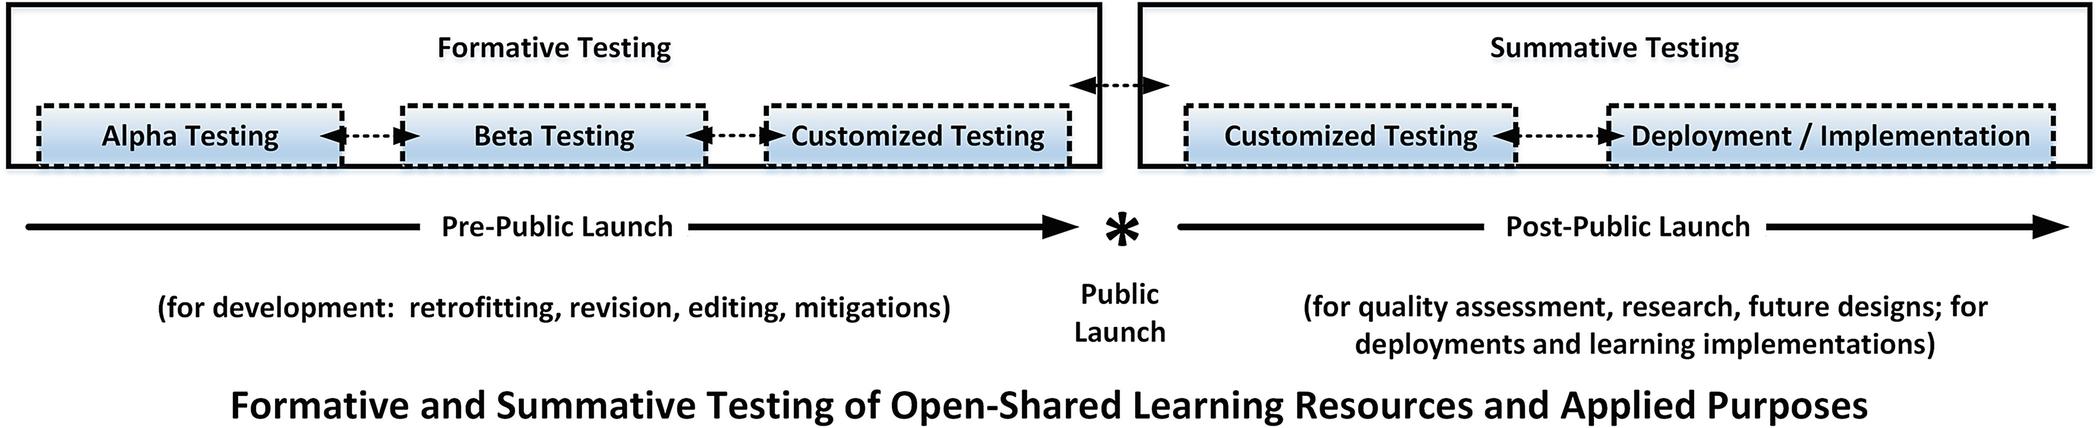 Alpha Testing, Beta Testing, and Customized Testing